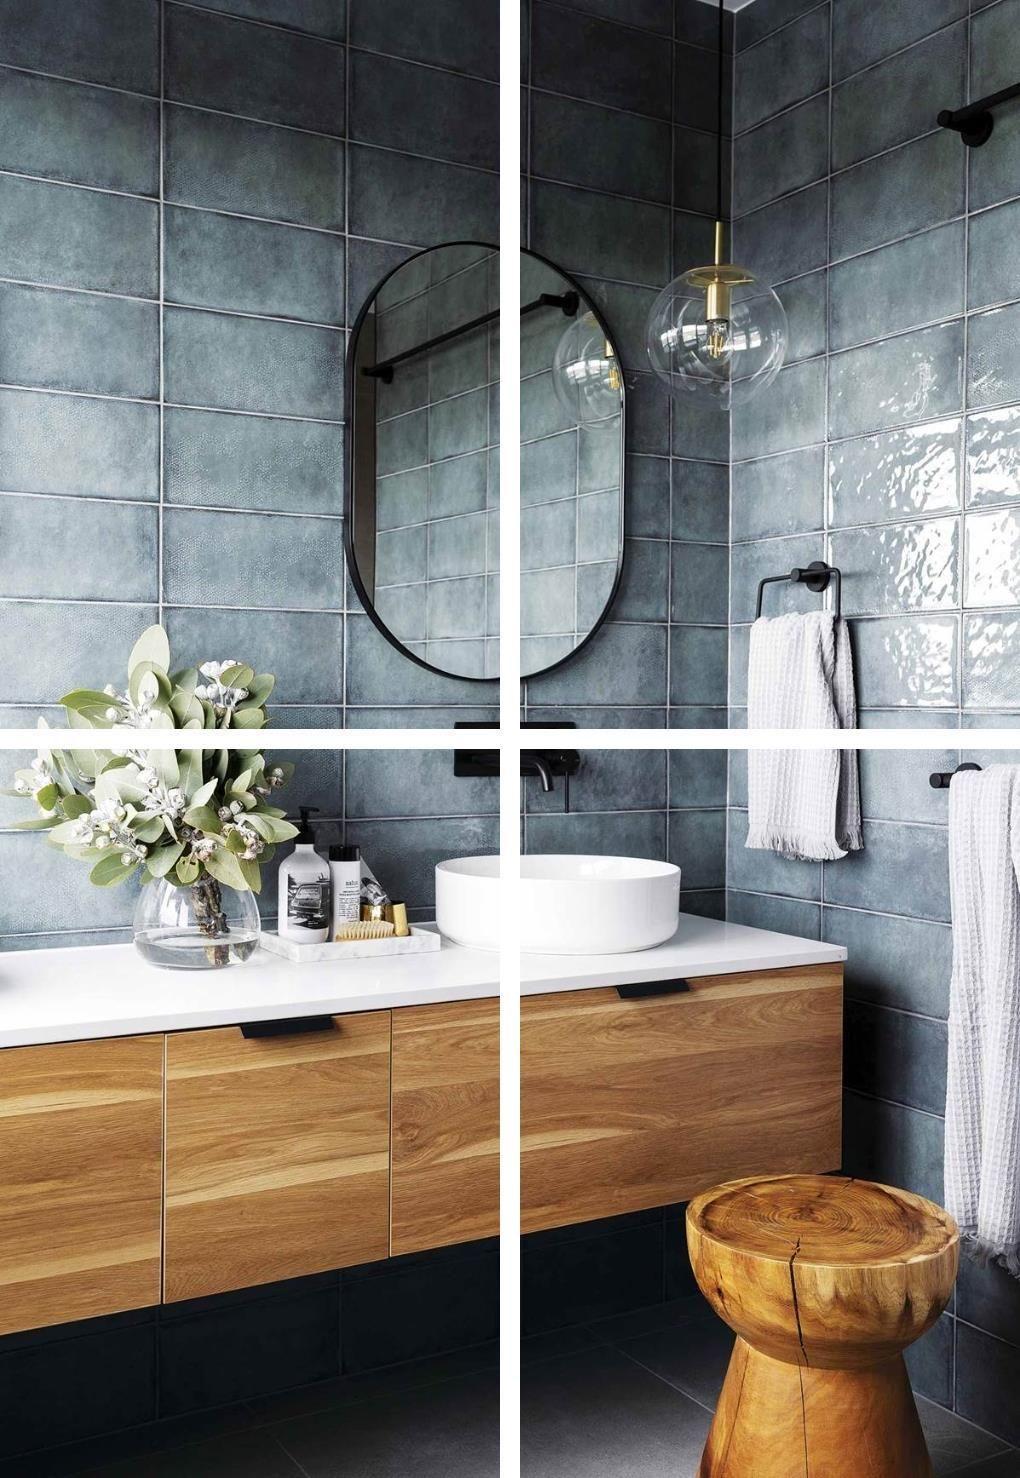 Pretty Bathroom Decor Affordable Bathroom Sets Bathroom Ensembles Accessories Glass Bath Accessories Blue Mosaic Bathroom Accessorie In 2020 White Bathroom Decor